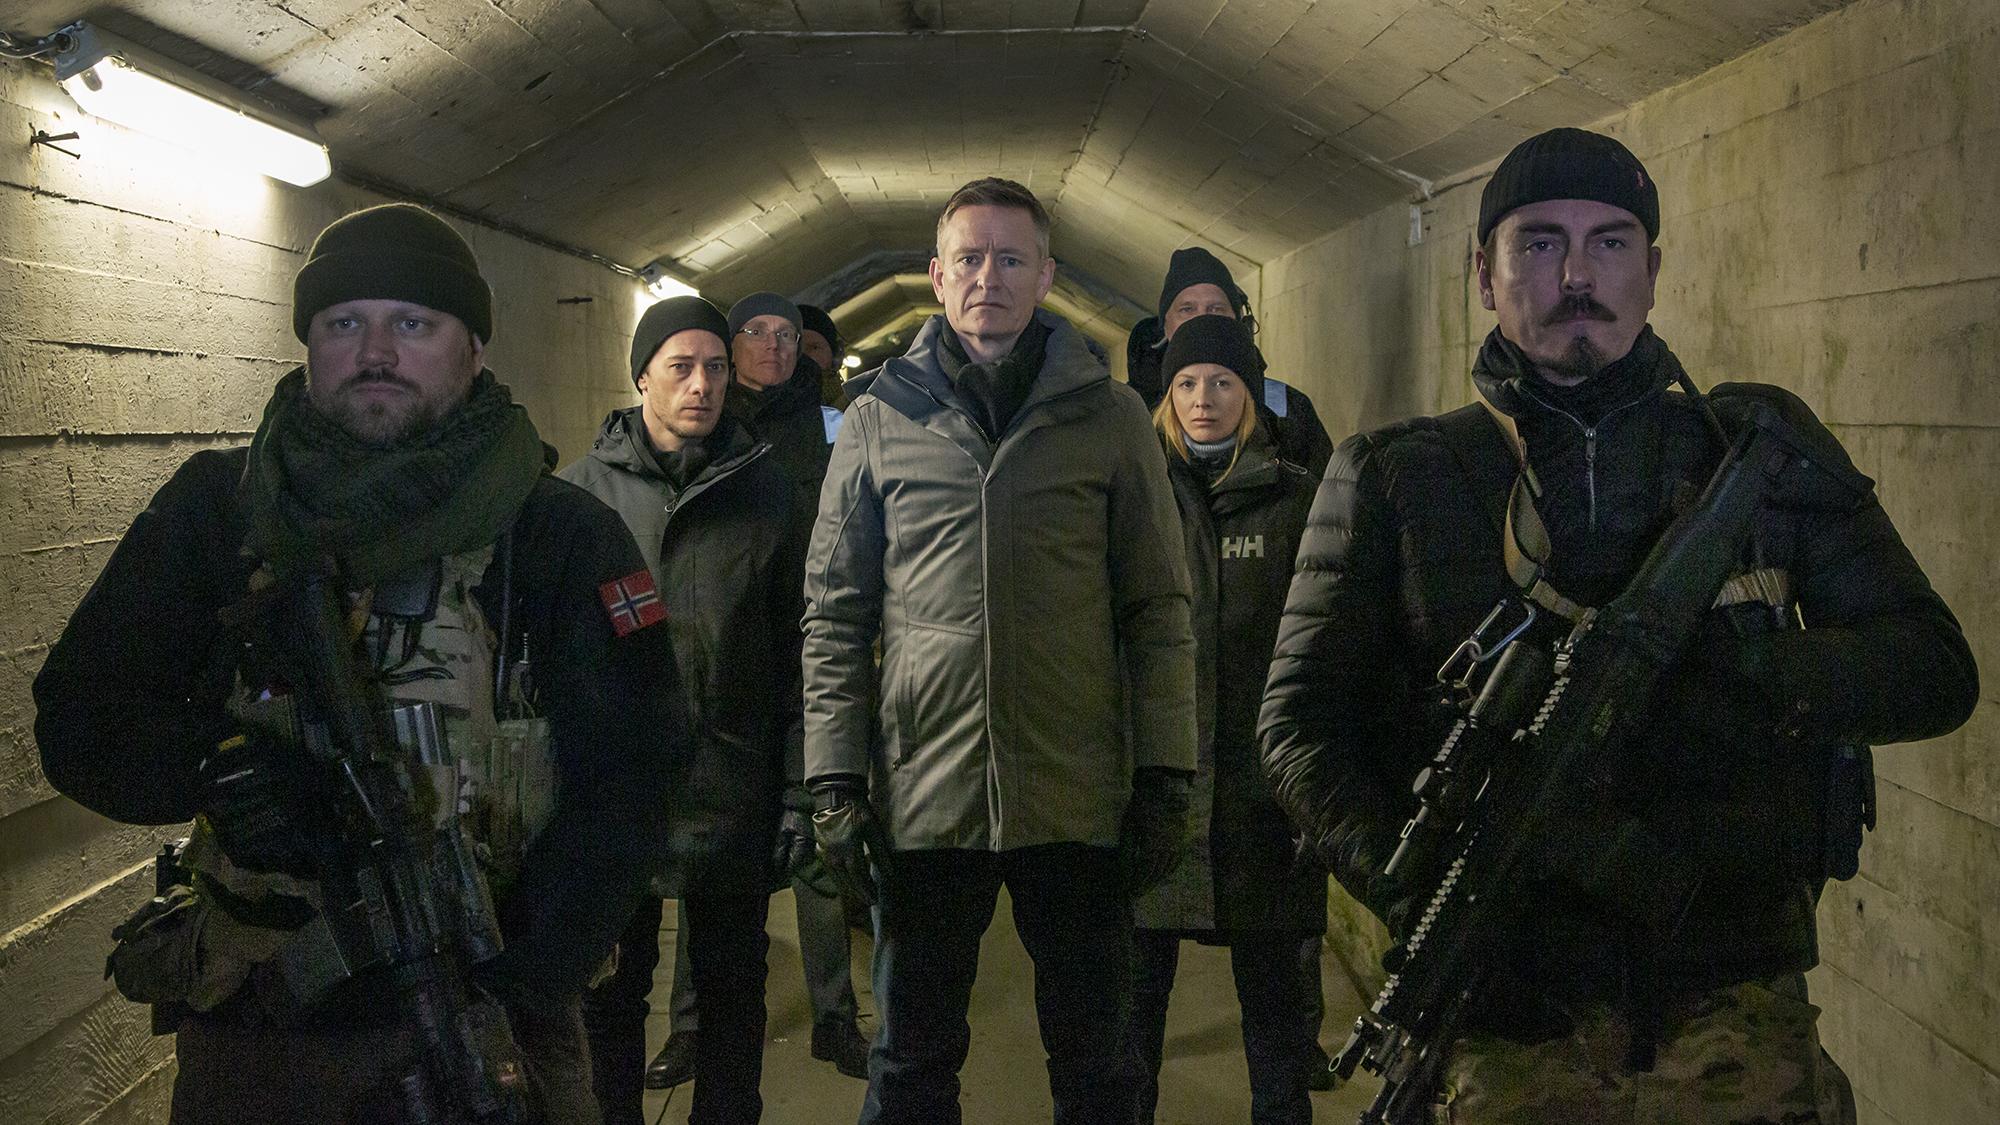 Poster for season 3 og the TV-series Occupied